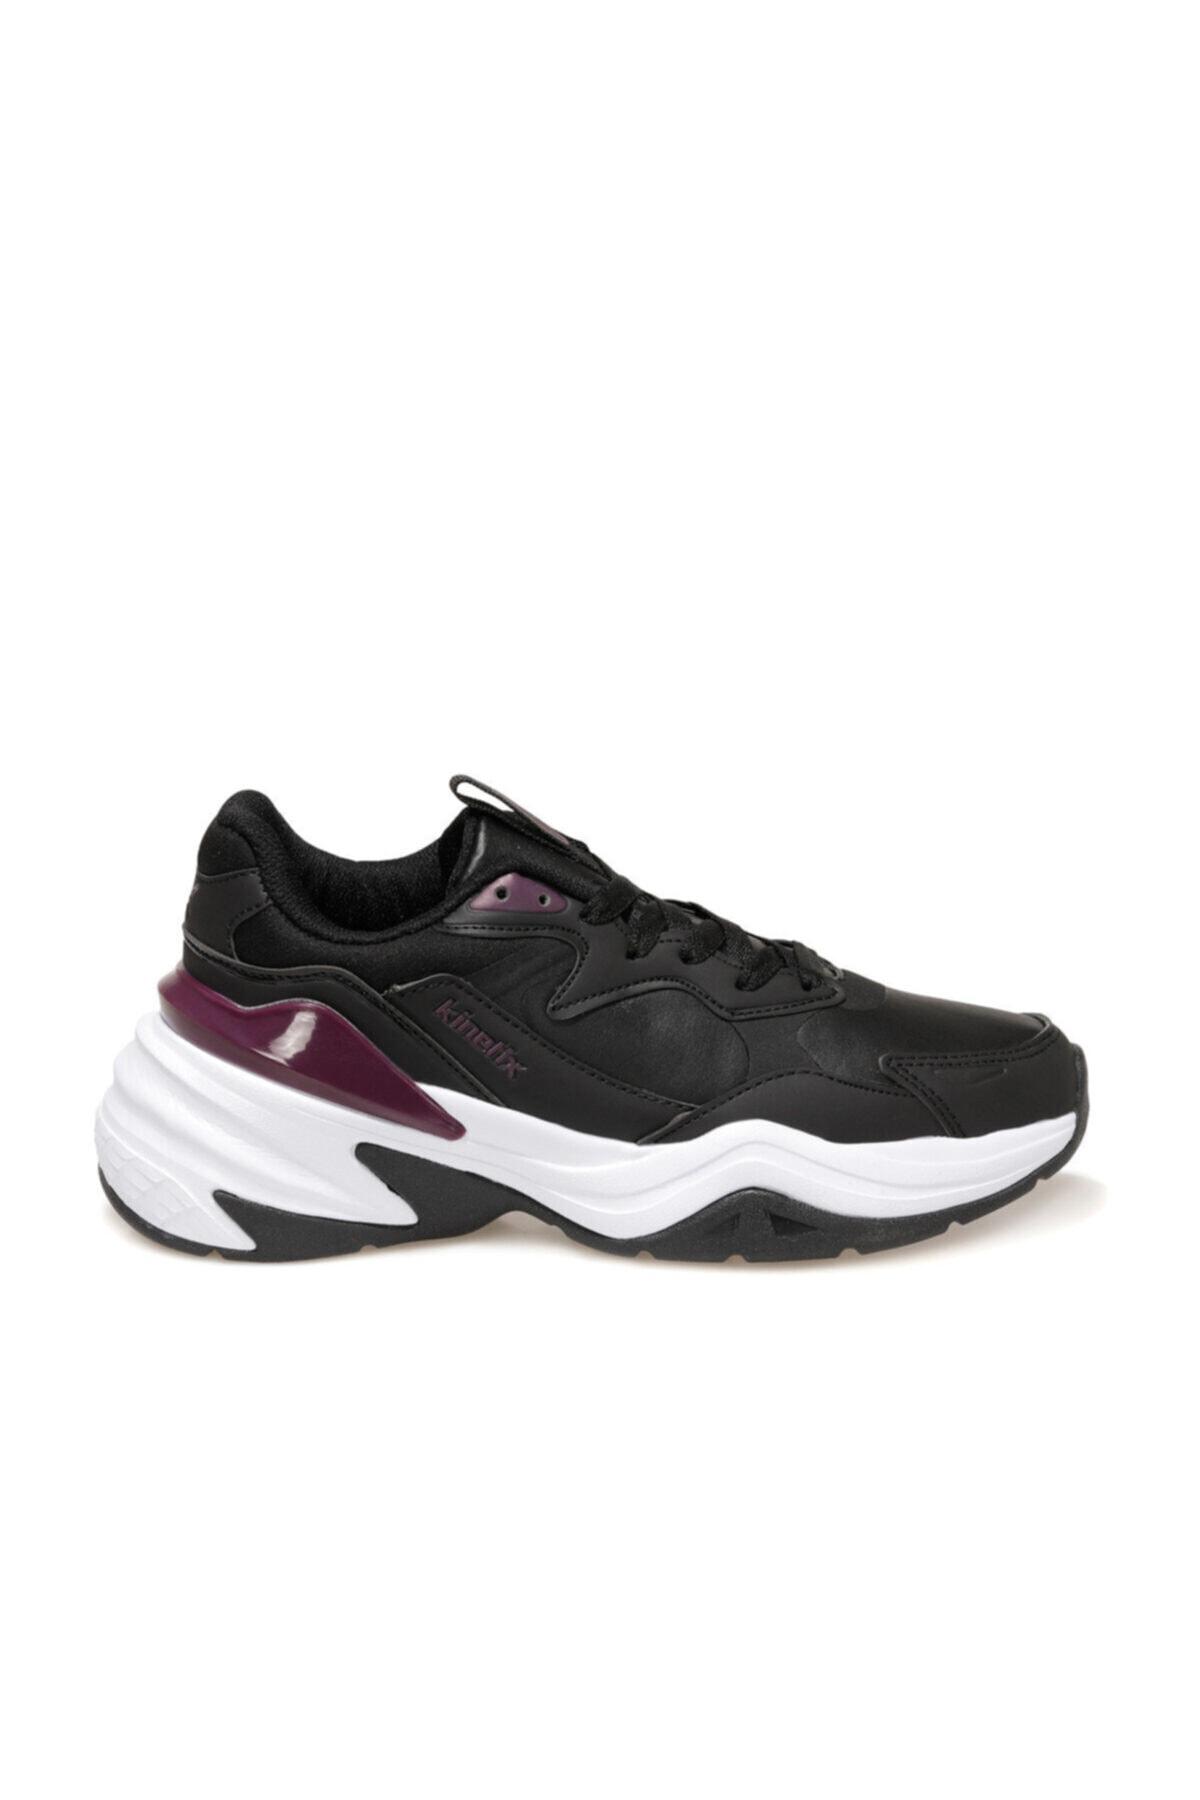 Kinetix REGAL PU W Siyah Kadın Sneaker Ayakkabı 100536054 2